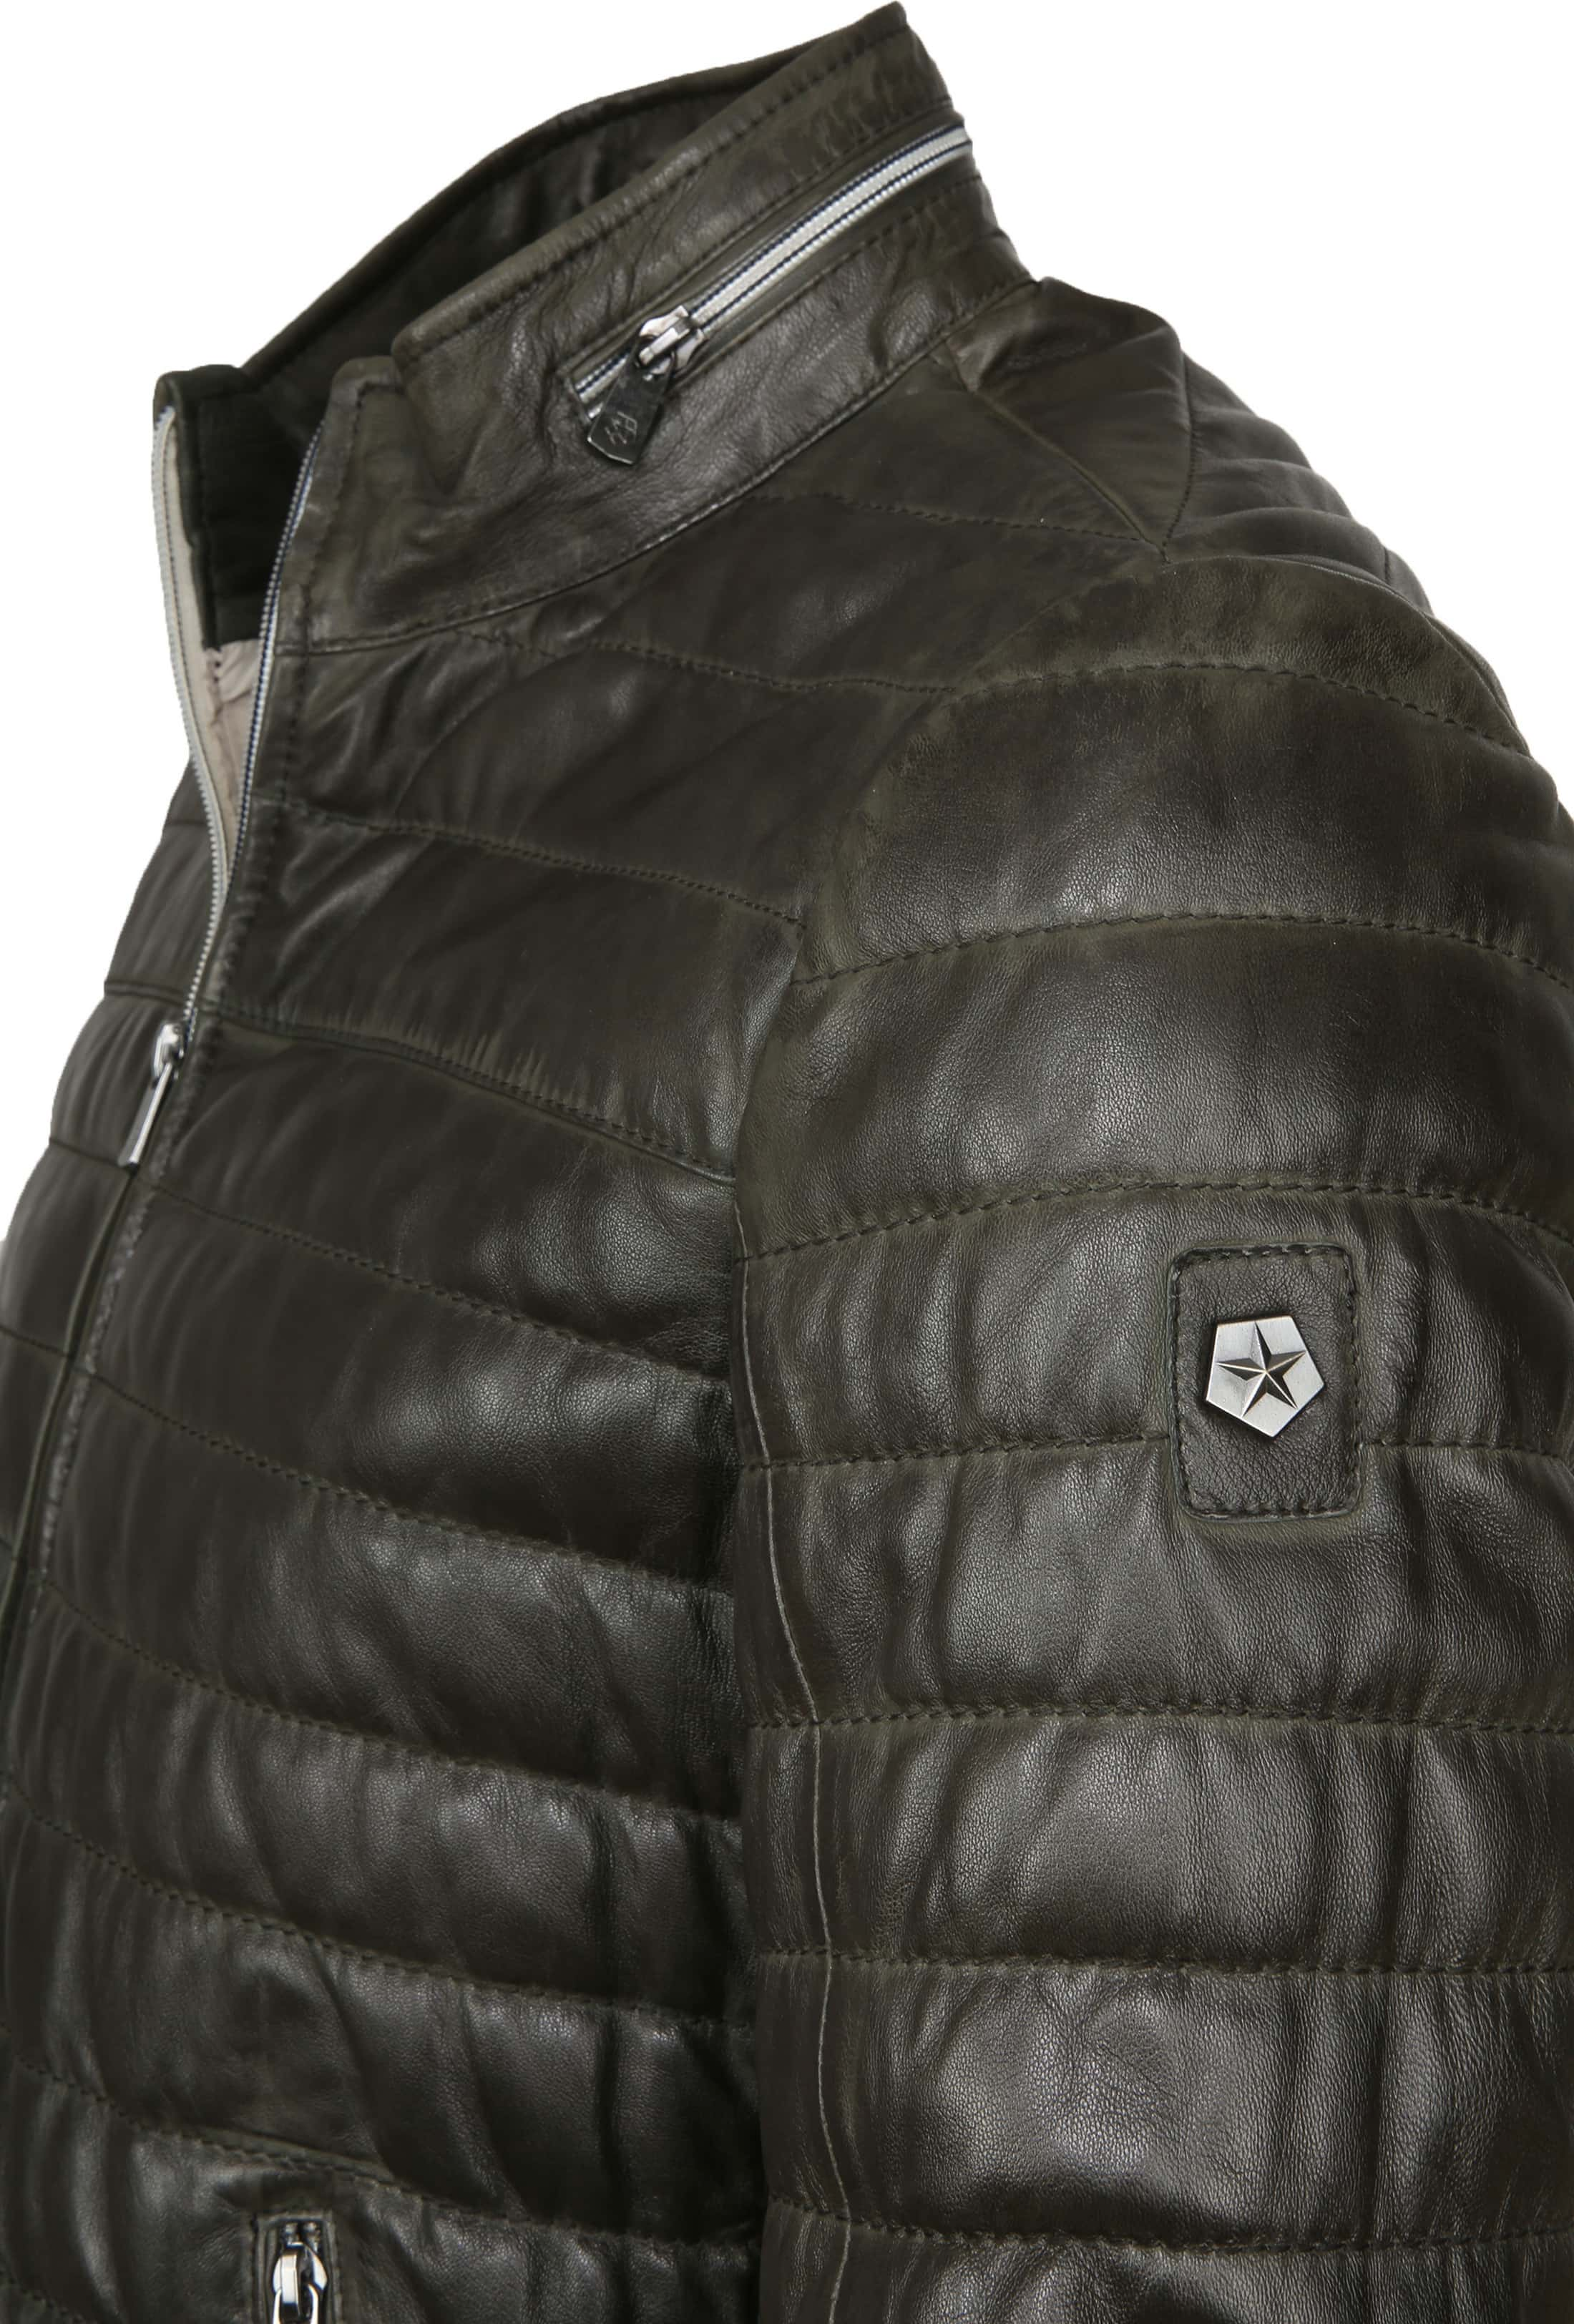 Milestone Tereno Leather Jacket Dark Green foto 1